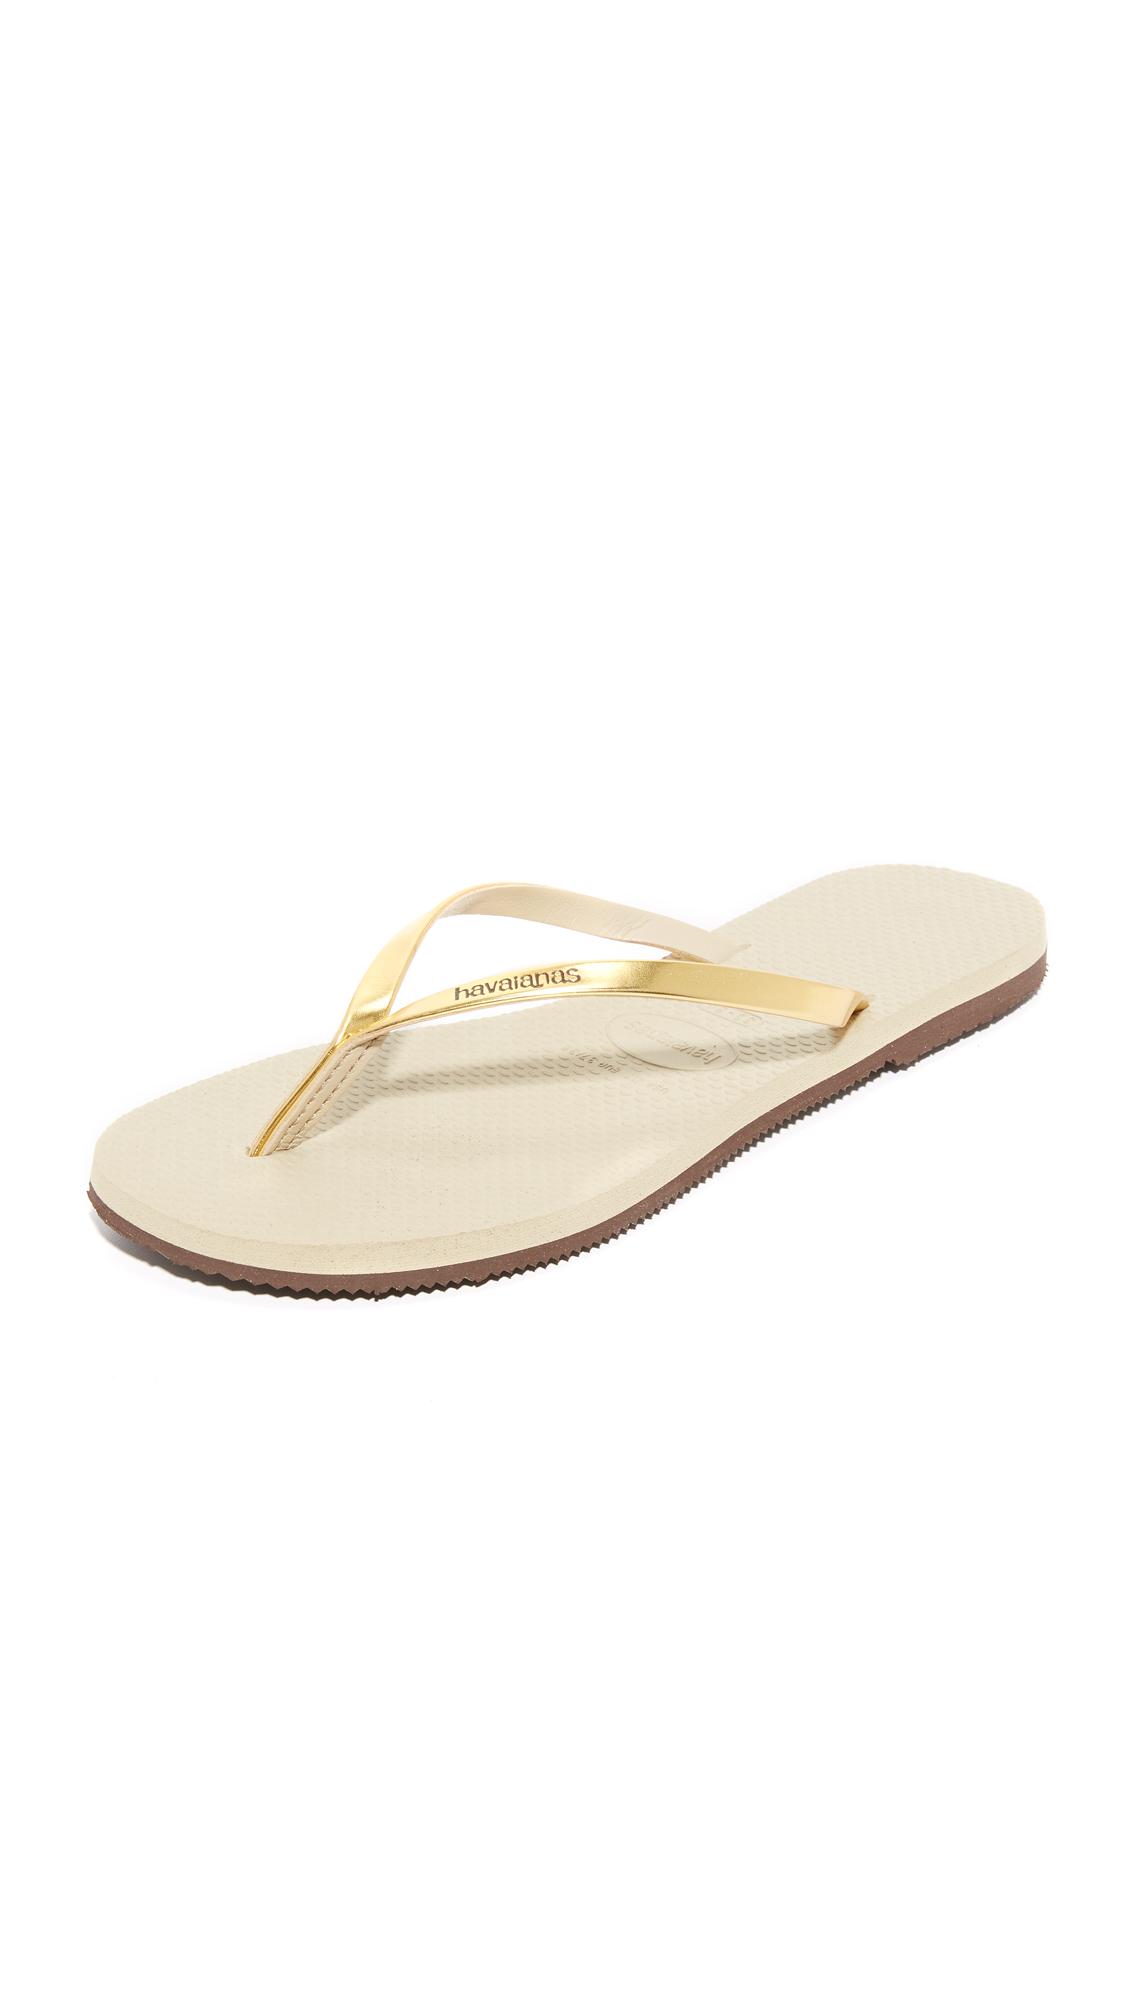 Havaianas You Metallic Flip Flops - Sand Grey/Light Golden at Shopbop